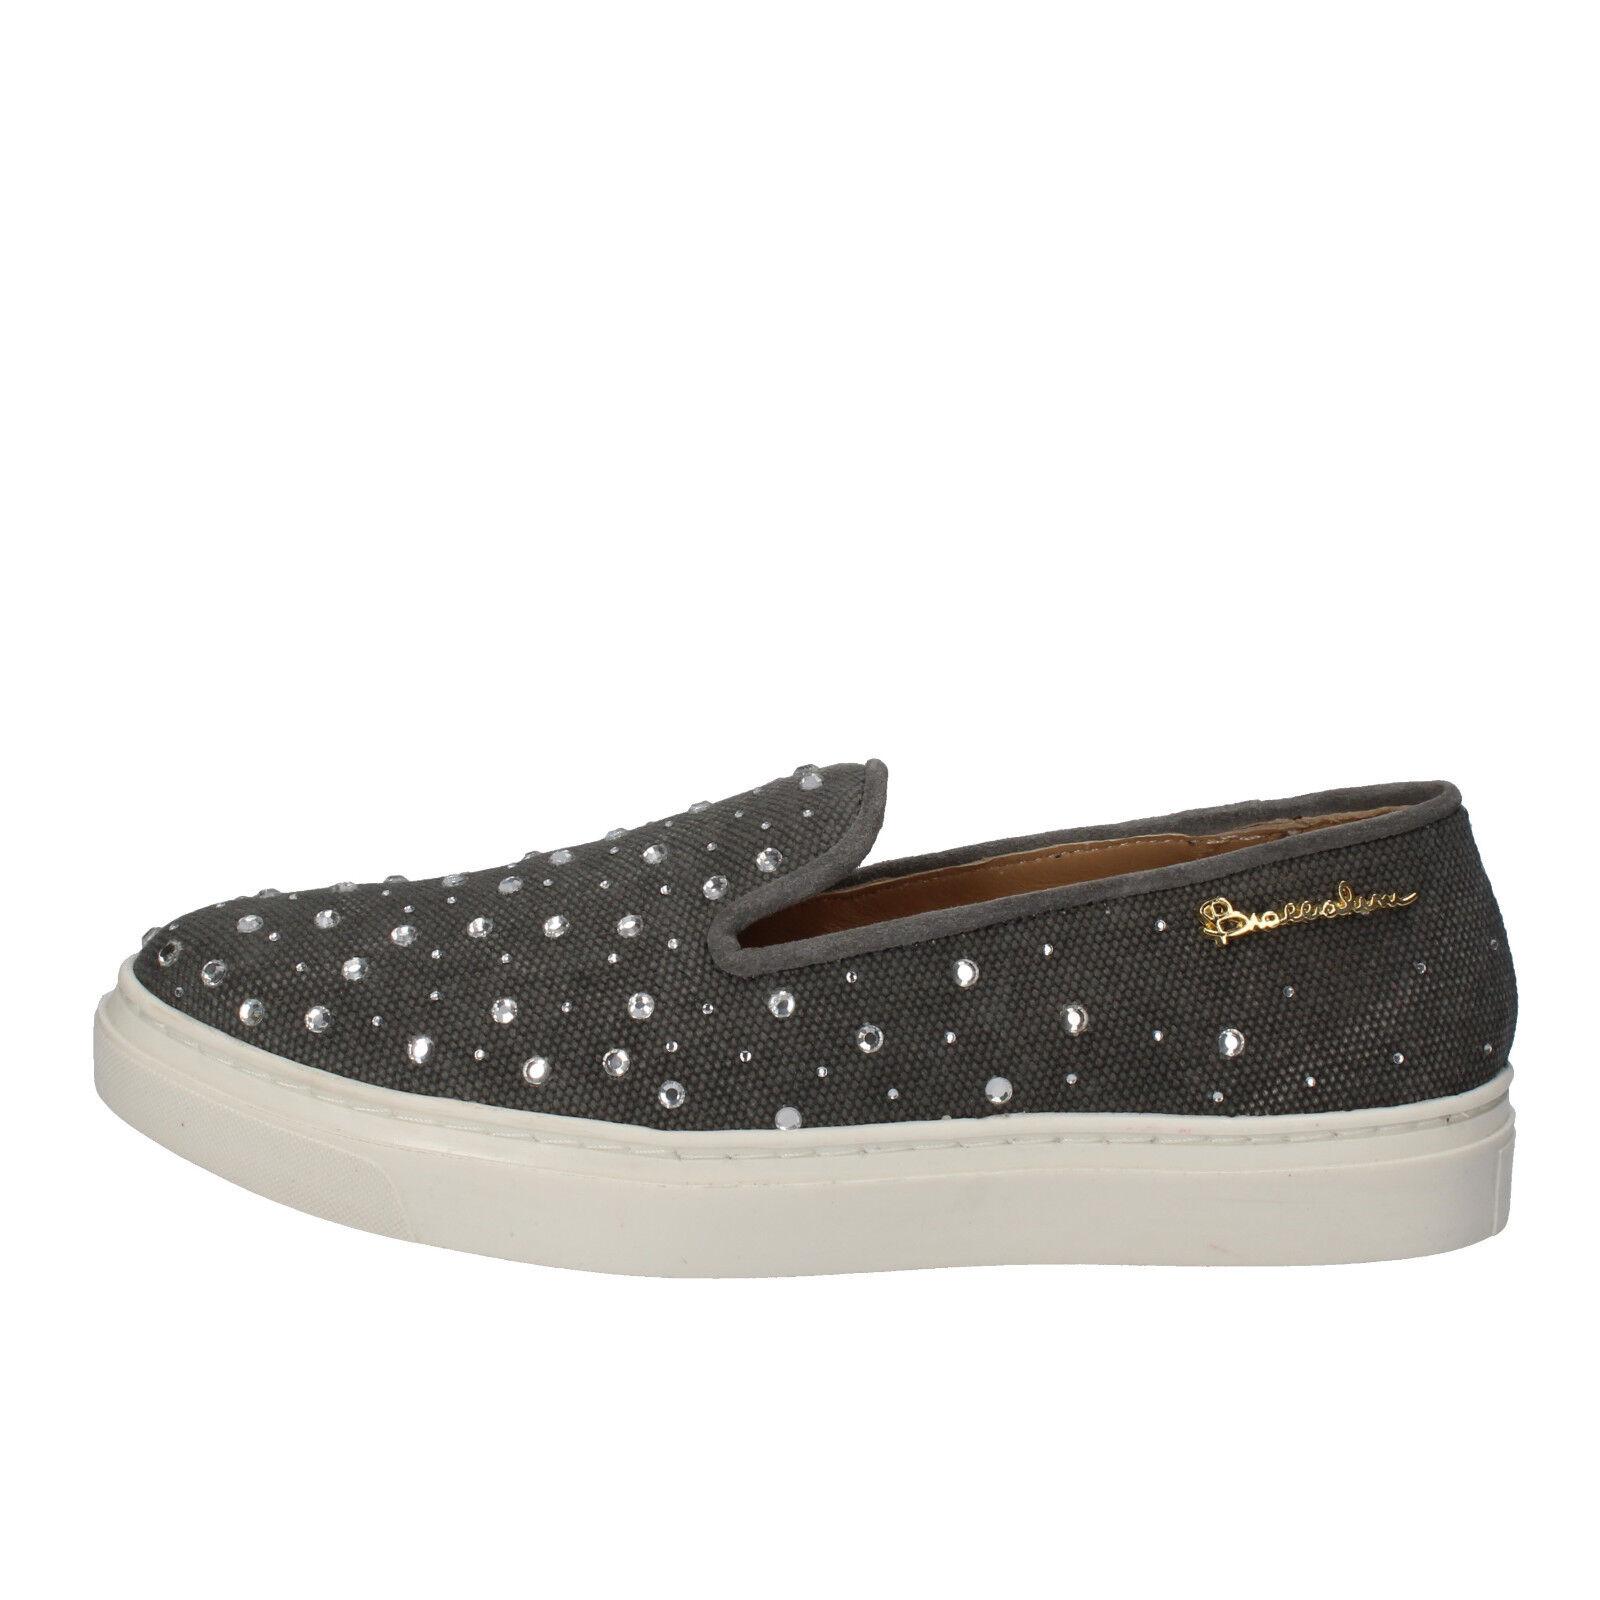 scarpe donna BRACCIALINI 37 EU AE539-B mocassini grigio tessuto strass AE539-B EU 0aa2e4